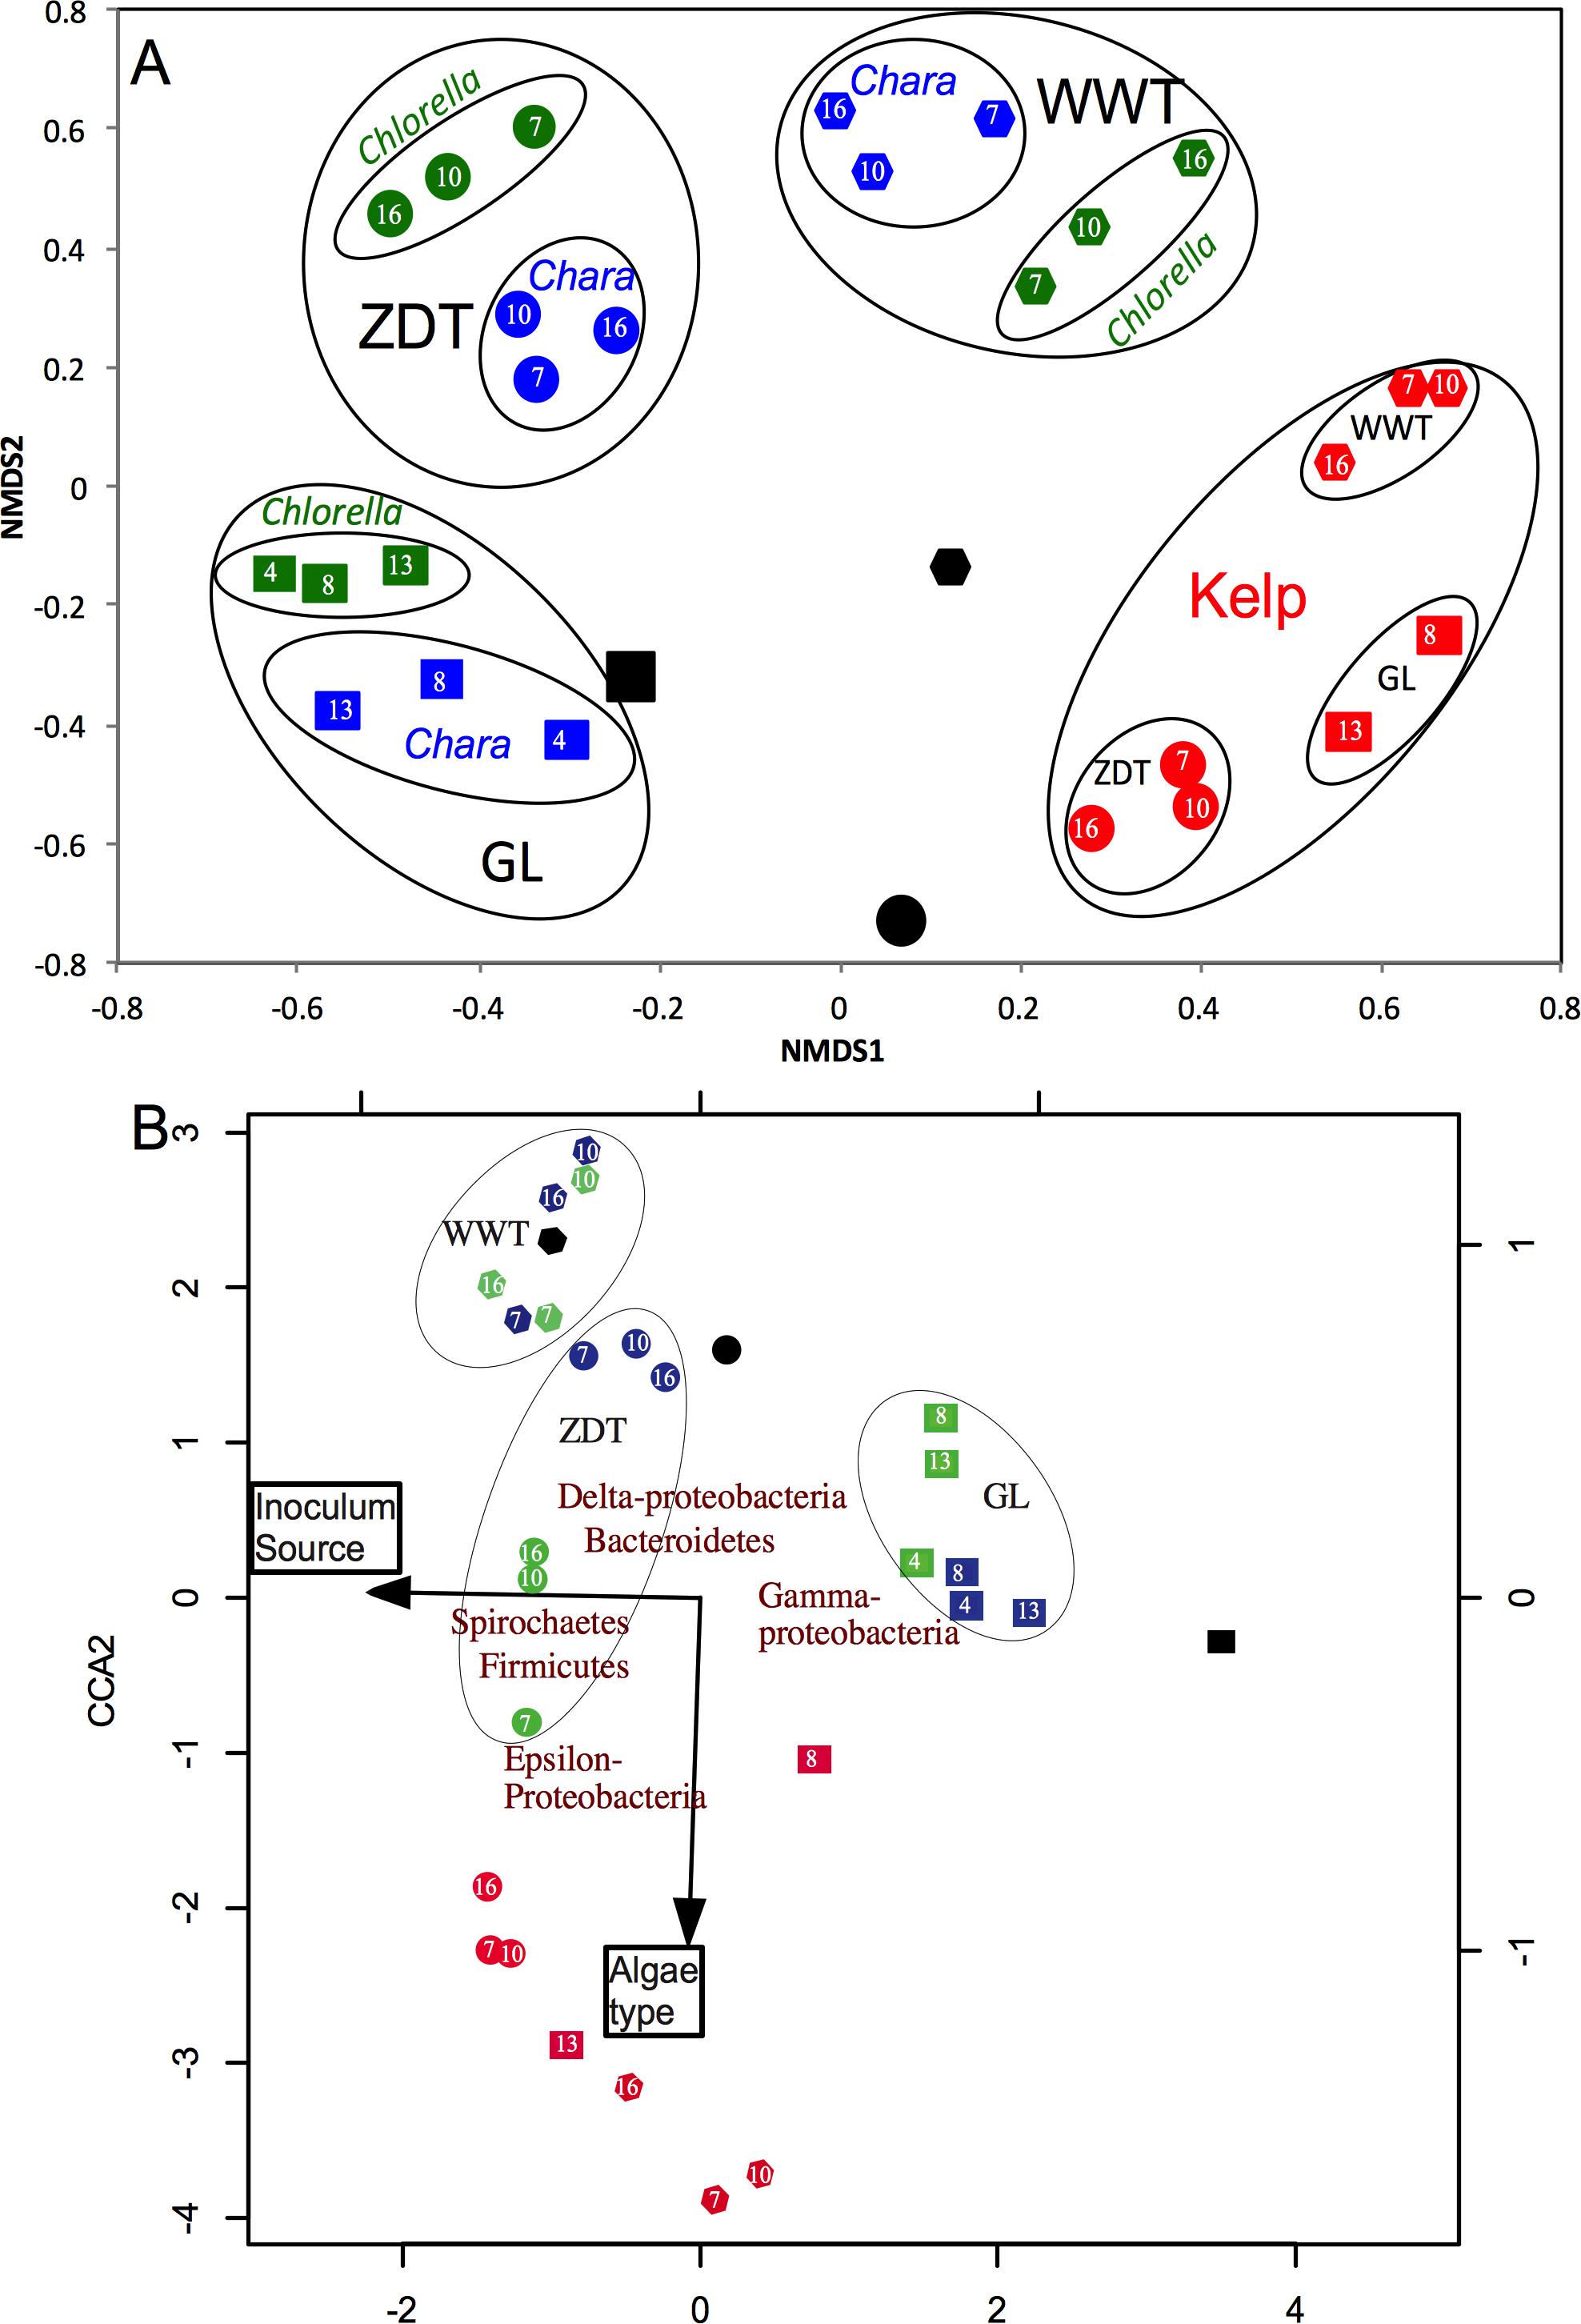 Microbial communities mediating algal detritus turnover